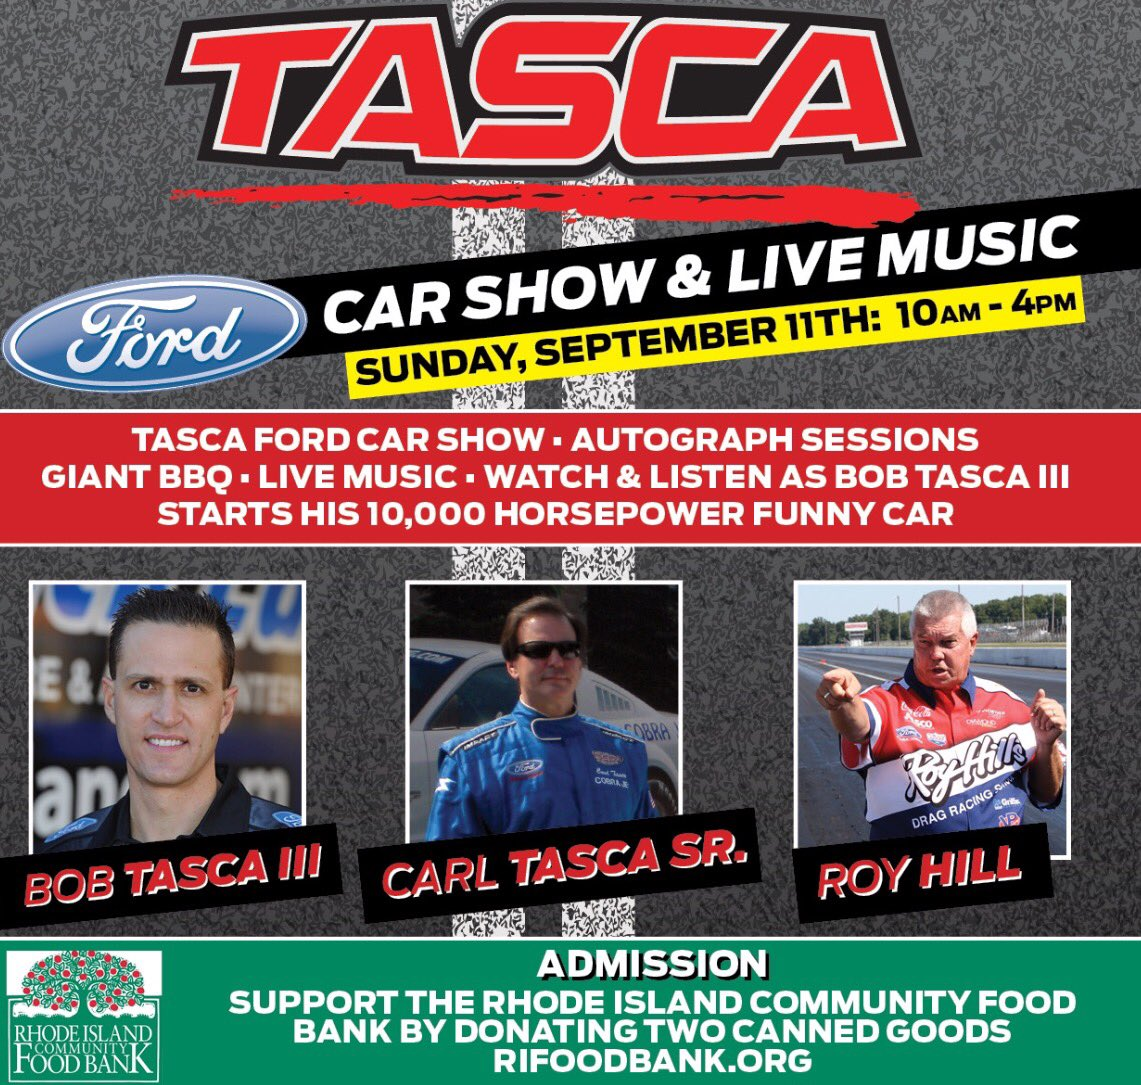 Bob Tasca III على تويتر Save The Date Saturday September Th - Tasca ford car show 2018